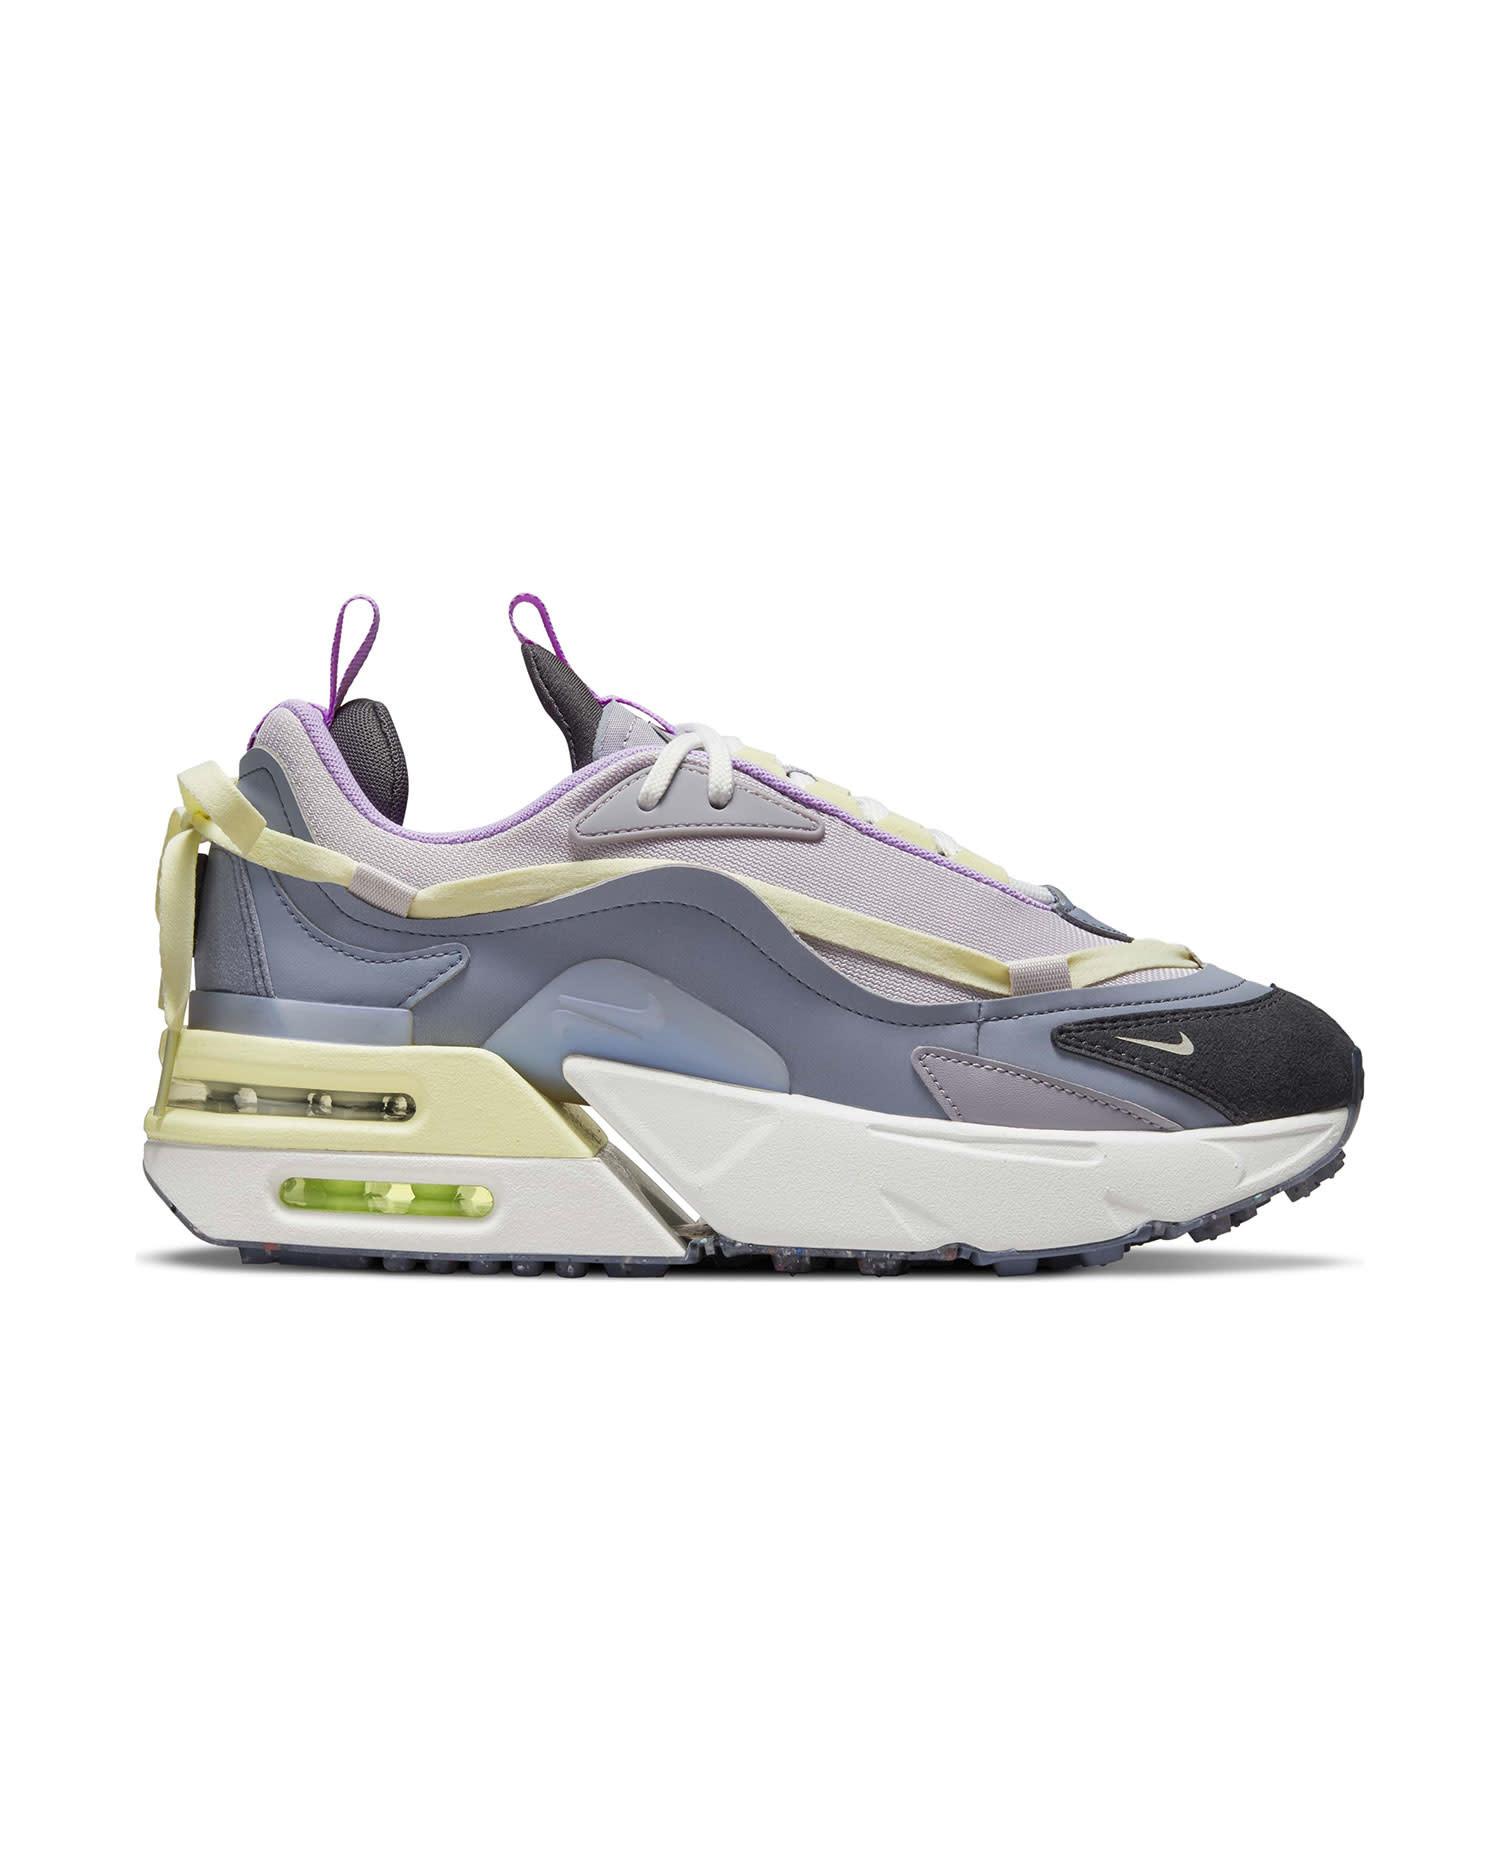 Nike Wmns Air Max Furyosa Ashen Slate/Summit White-Venice